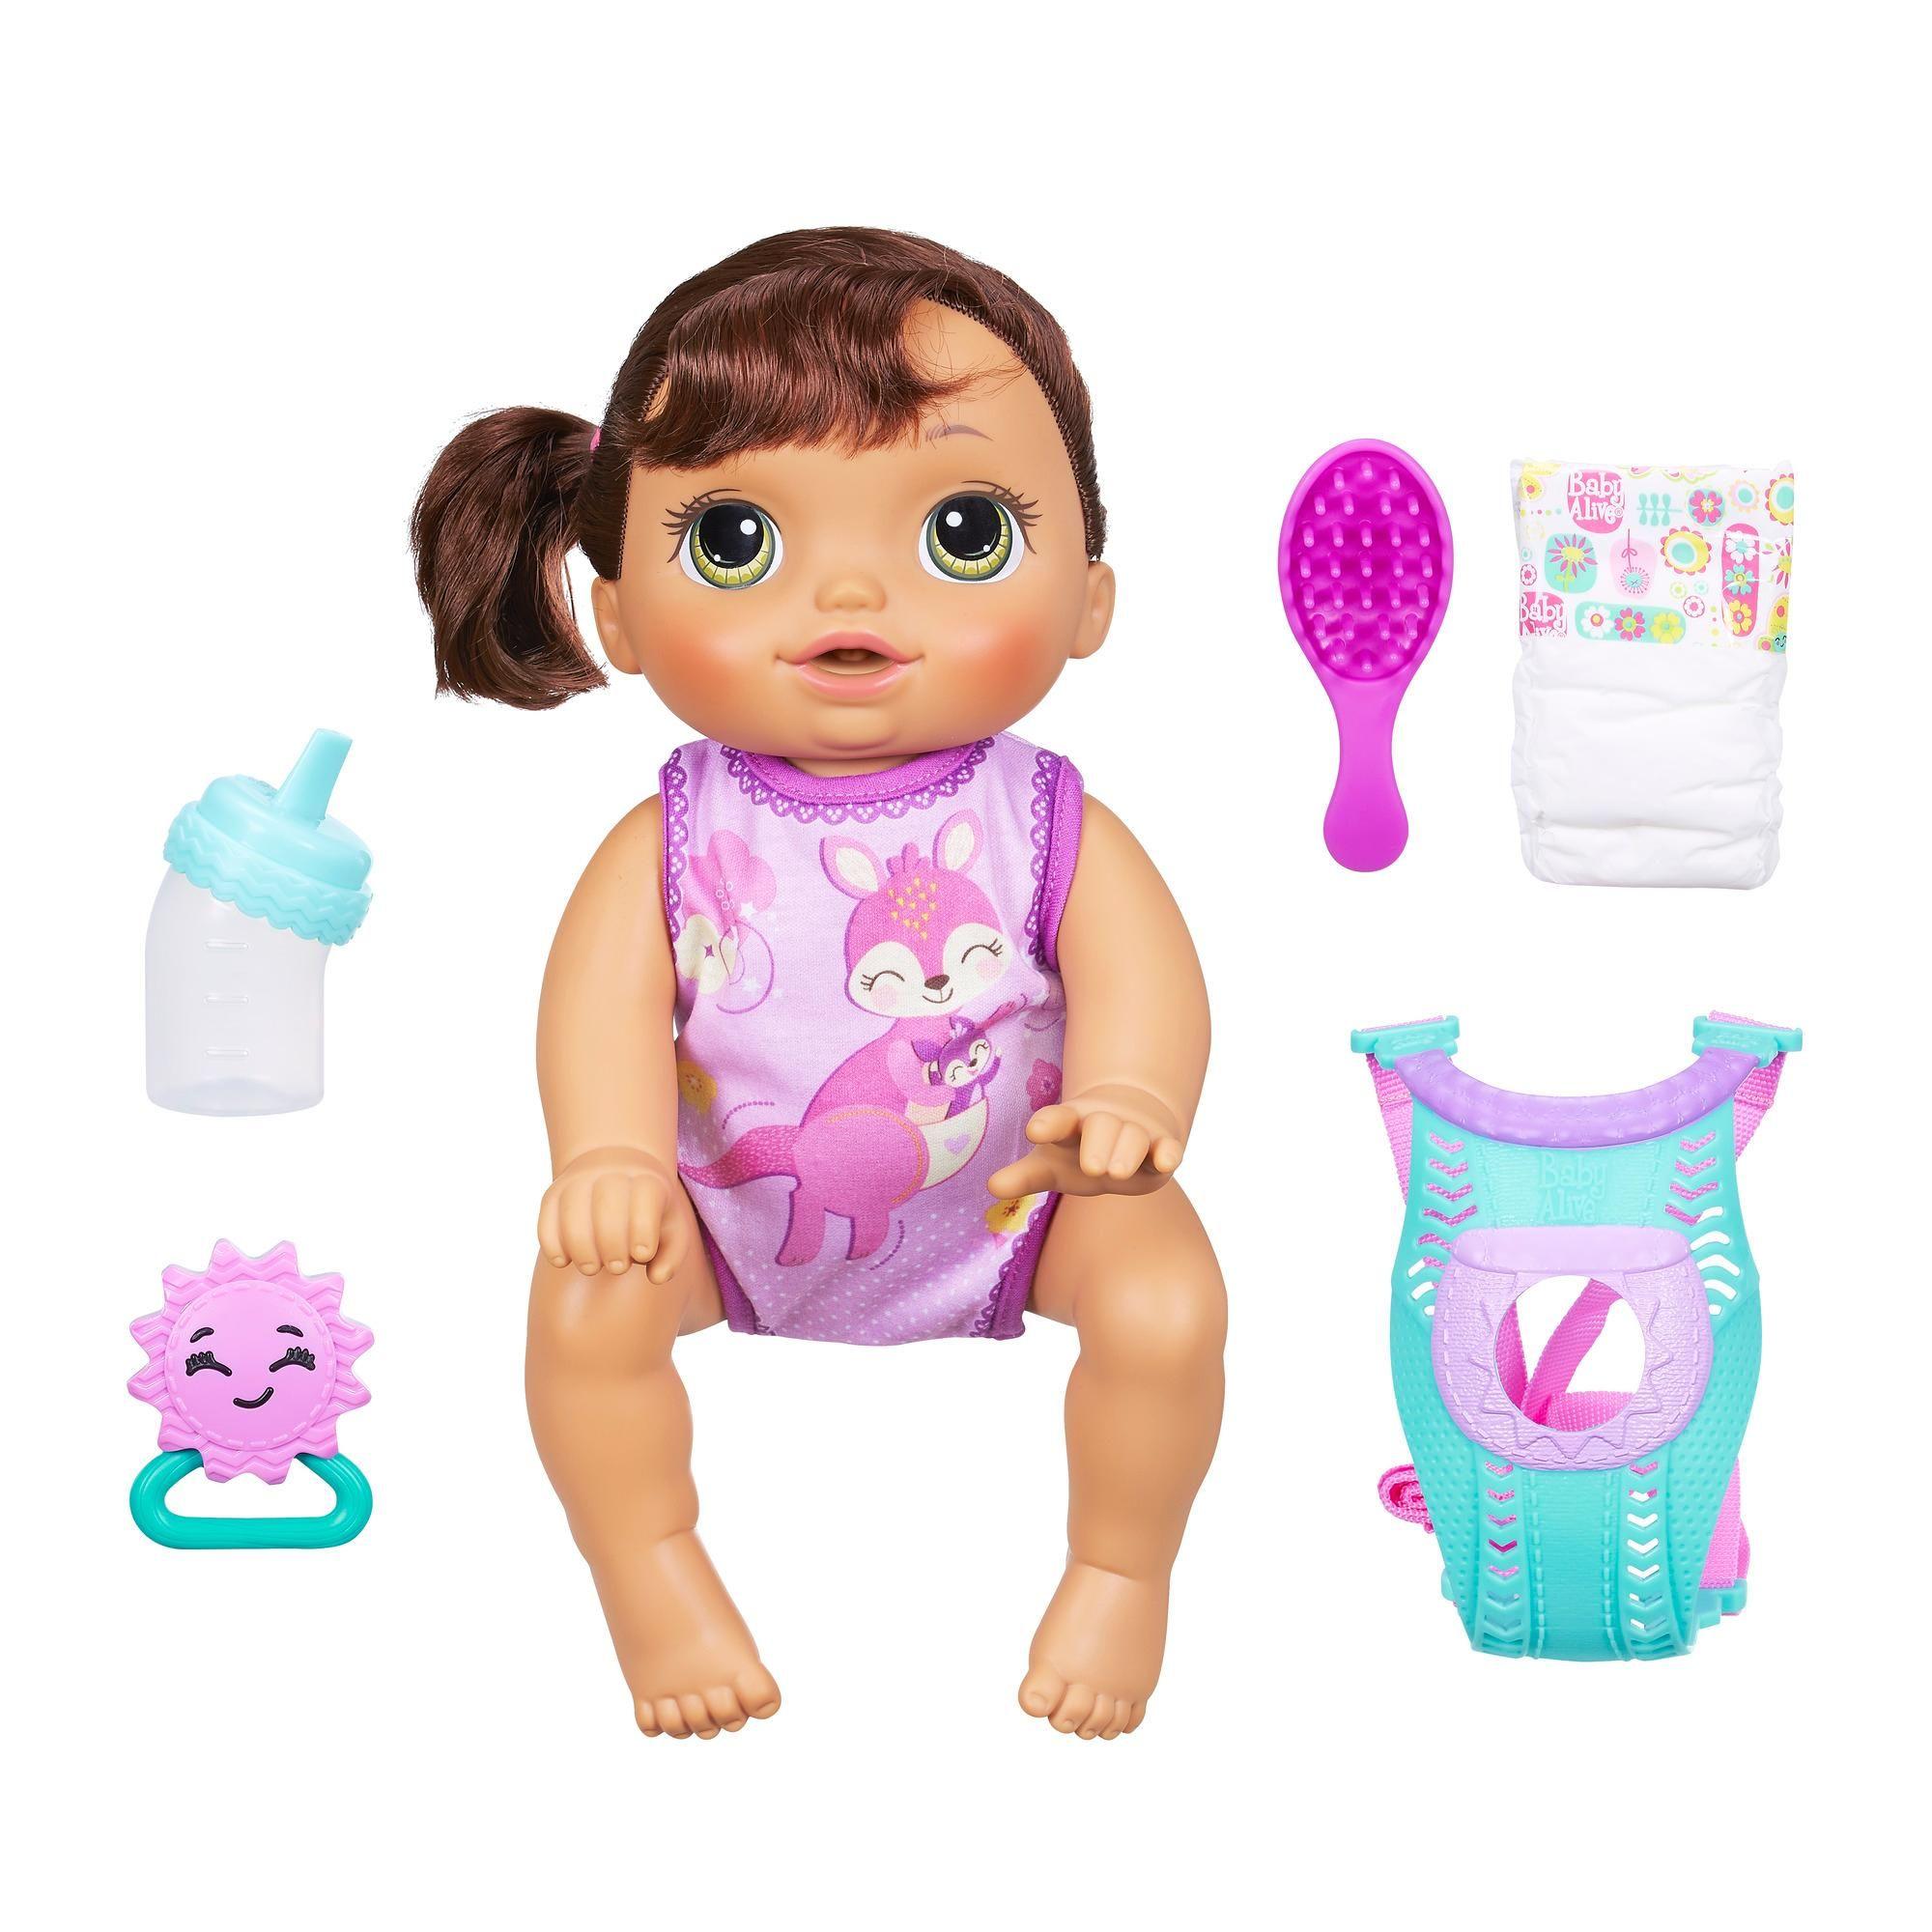 Baby Alive Baby Go Bye Bye Brunette Toys For Girls Baby Alive Baby Alive Baby Alive Dolls Baby Doll Nursery